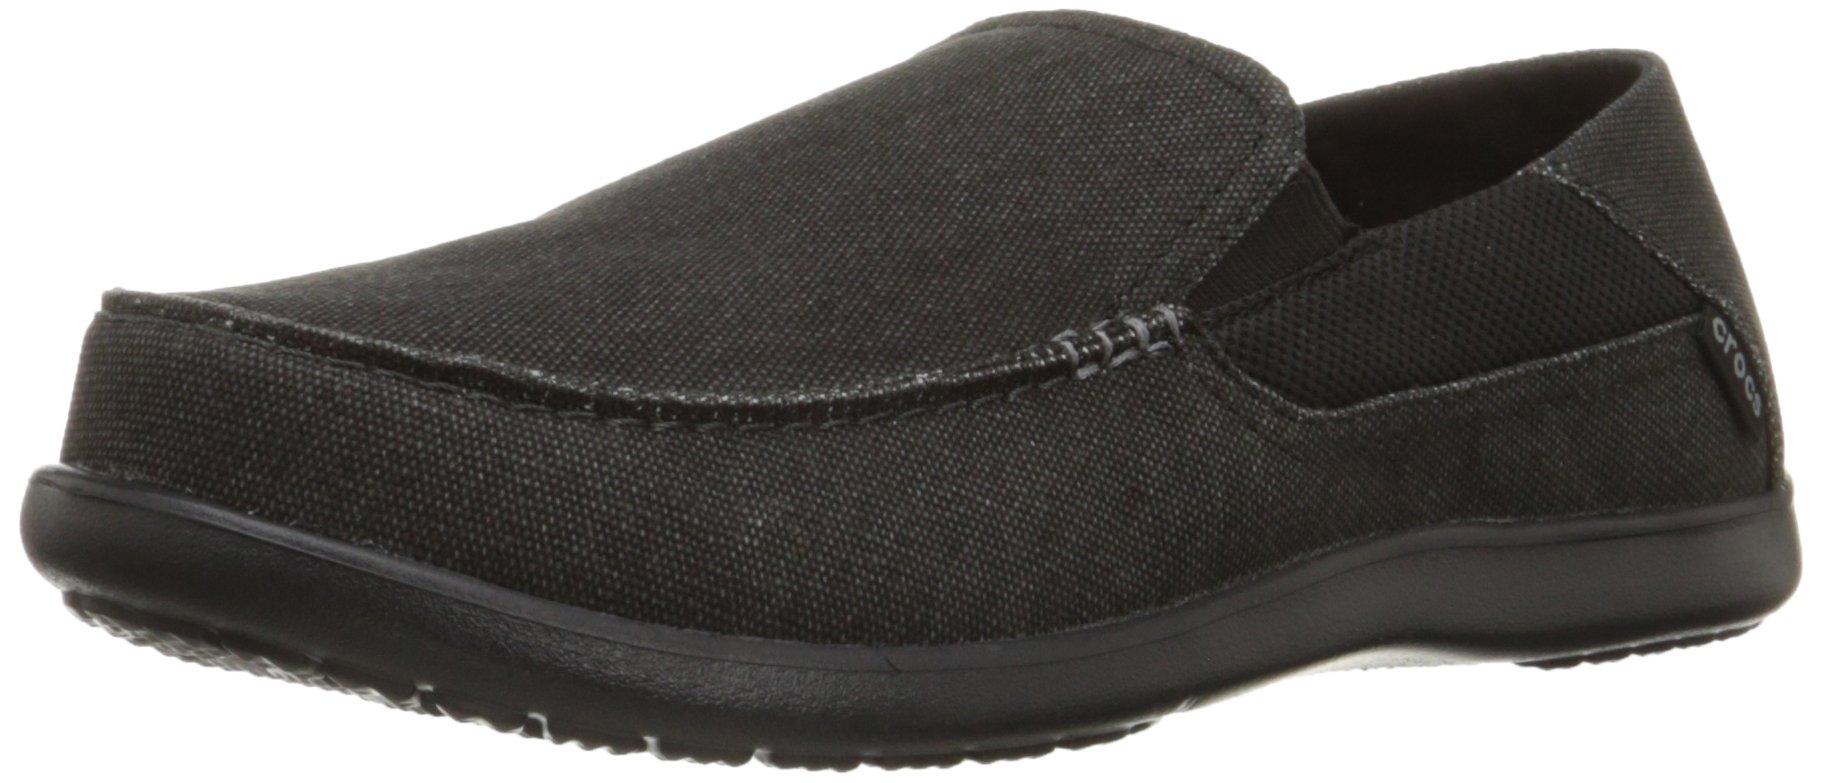 Crocs Men's Santa Cruz 2 Luxe M Slip-On Loafer, Black/Black, 10 M US